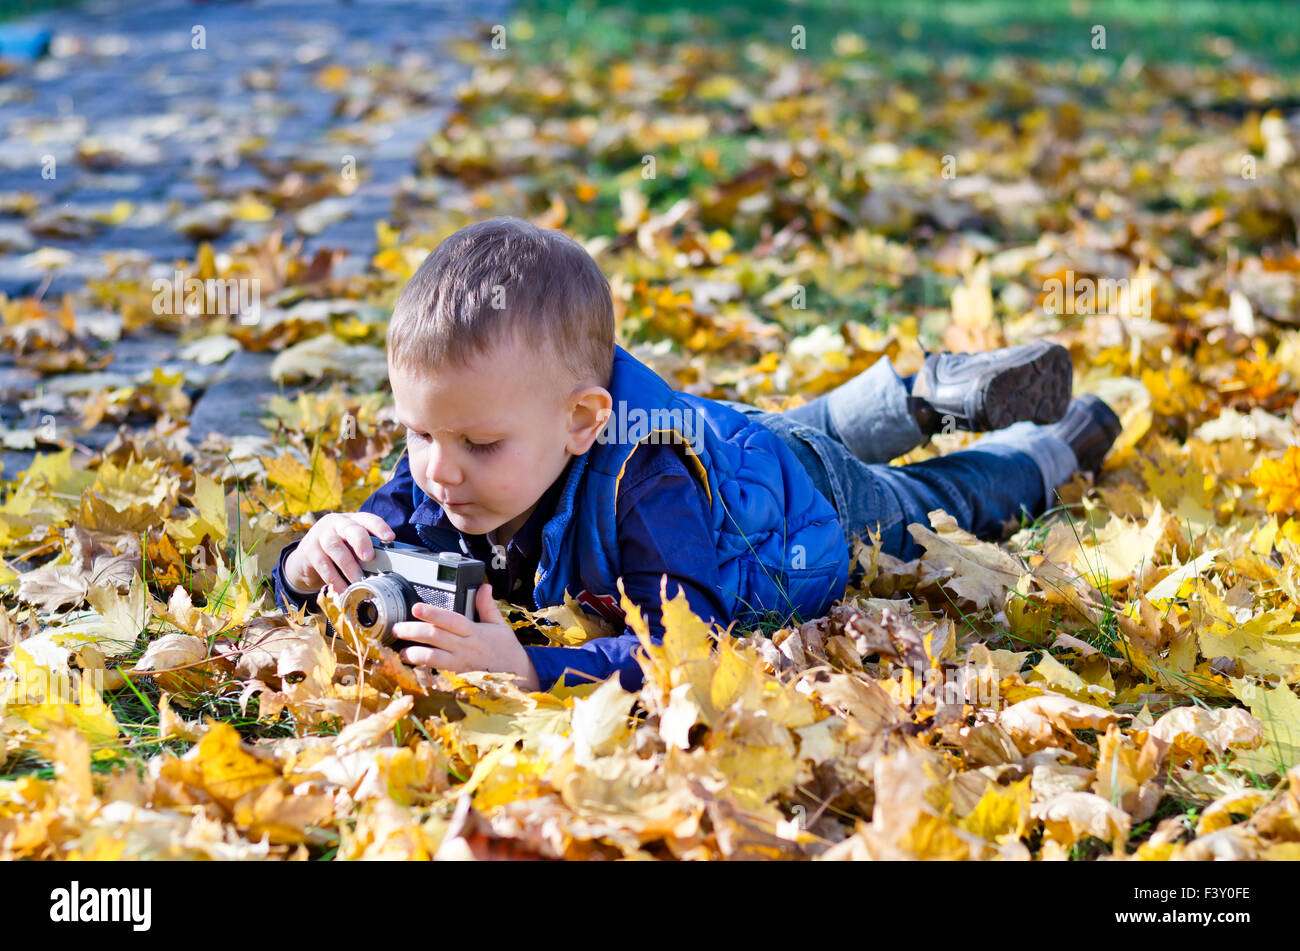 Small boy with a retro slr camera - Stock Image